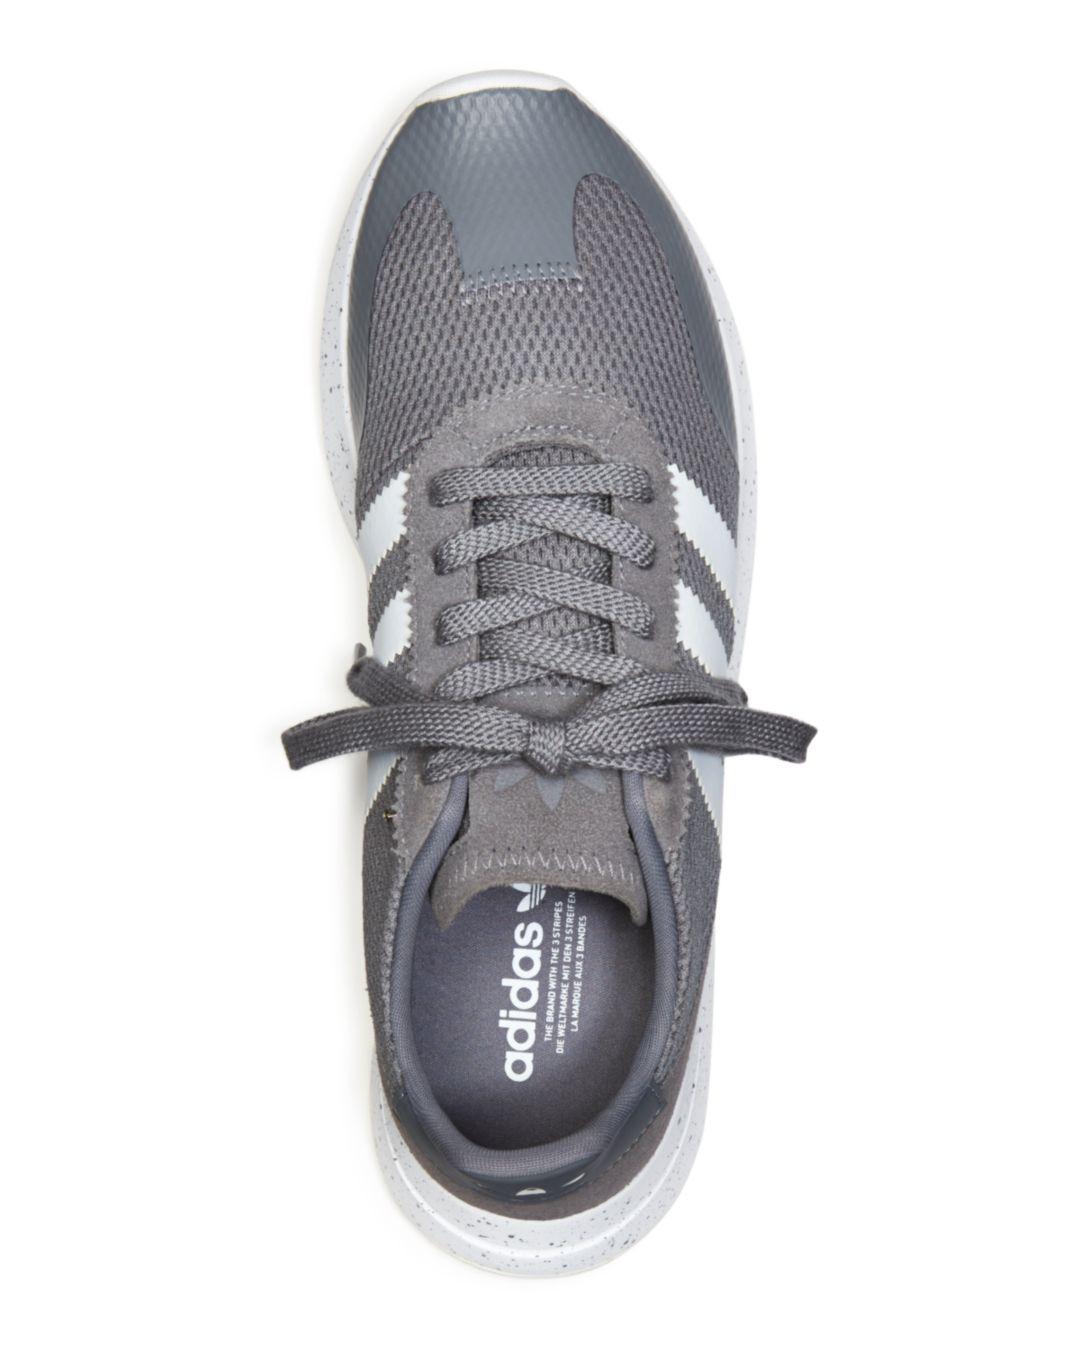 738647ecd Adidas - Gray Women s Flb Runner Sneakers - Lyst. View fullscreen